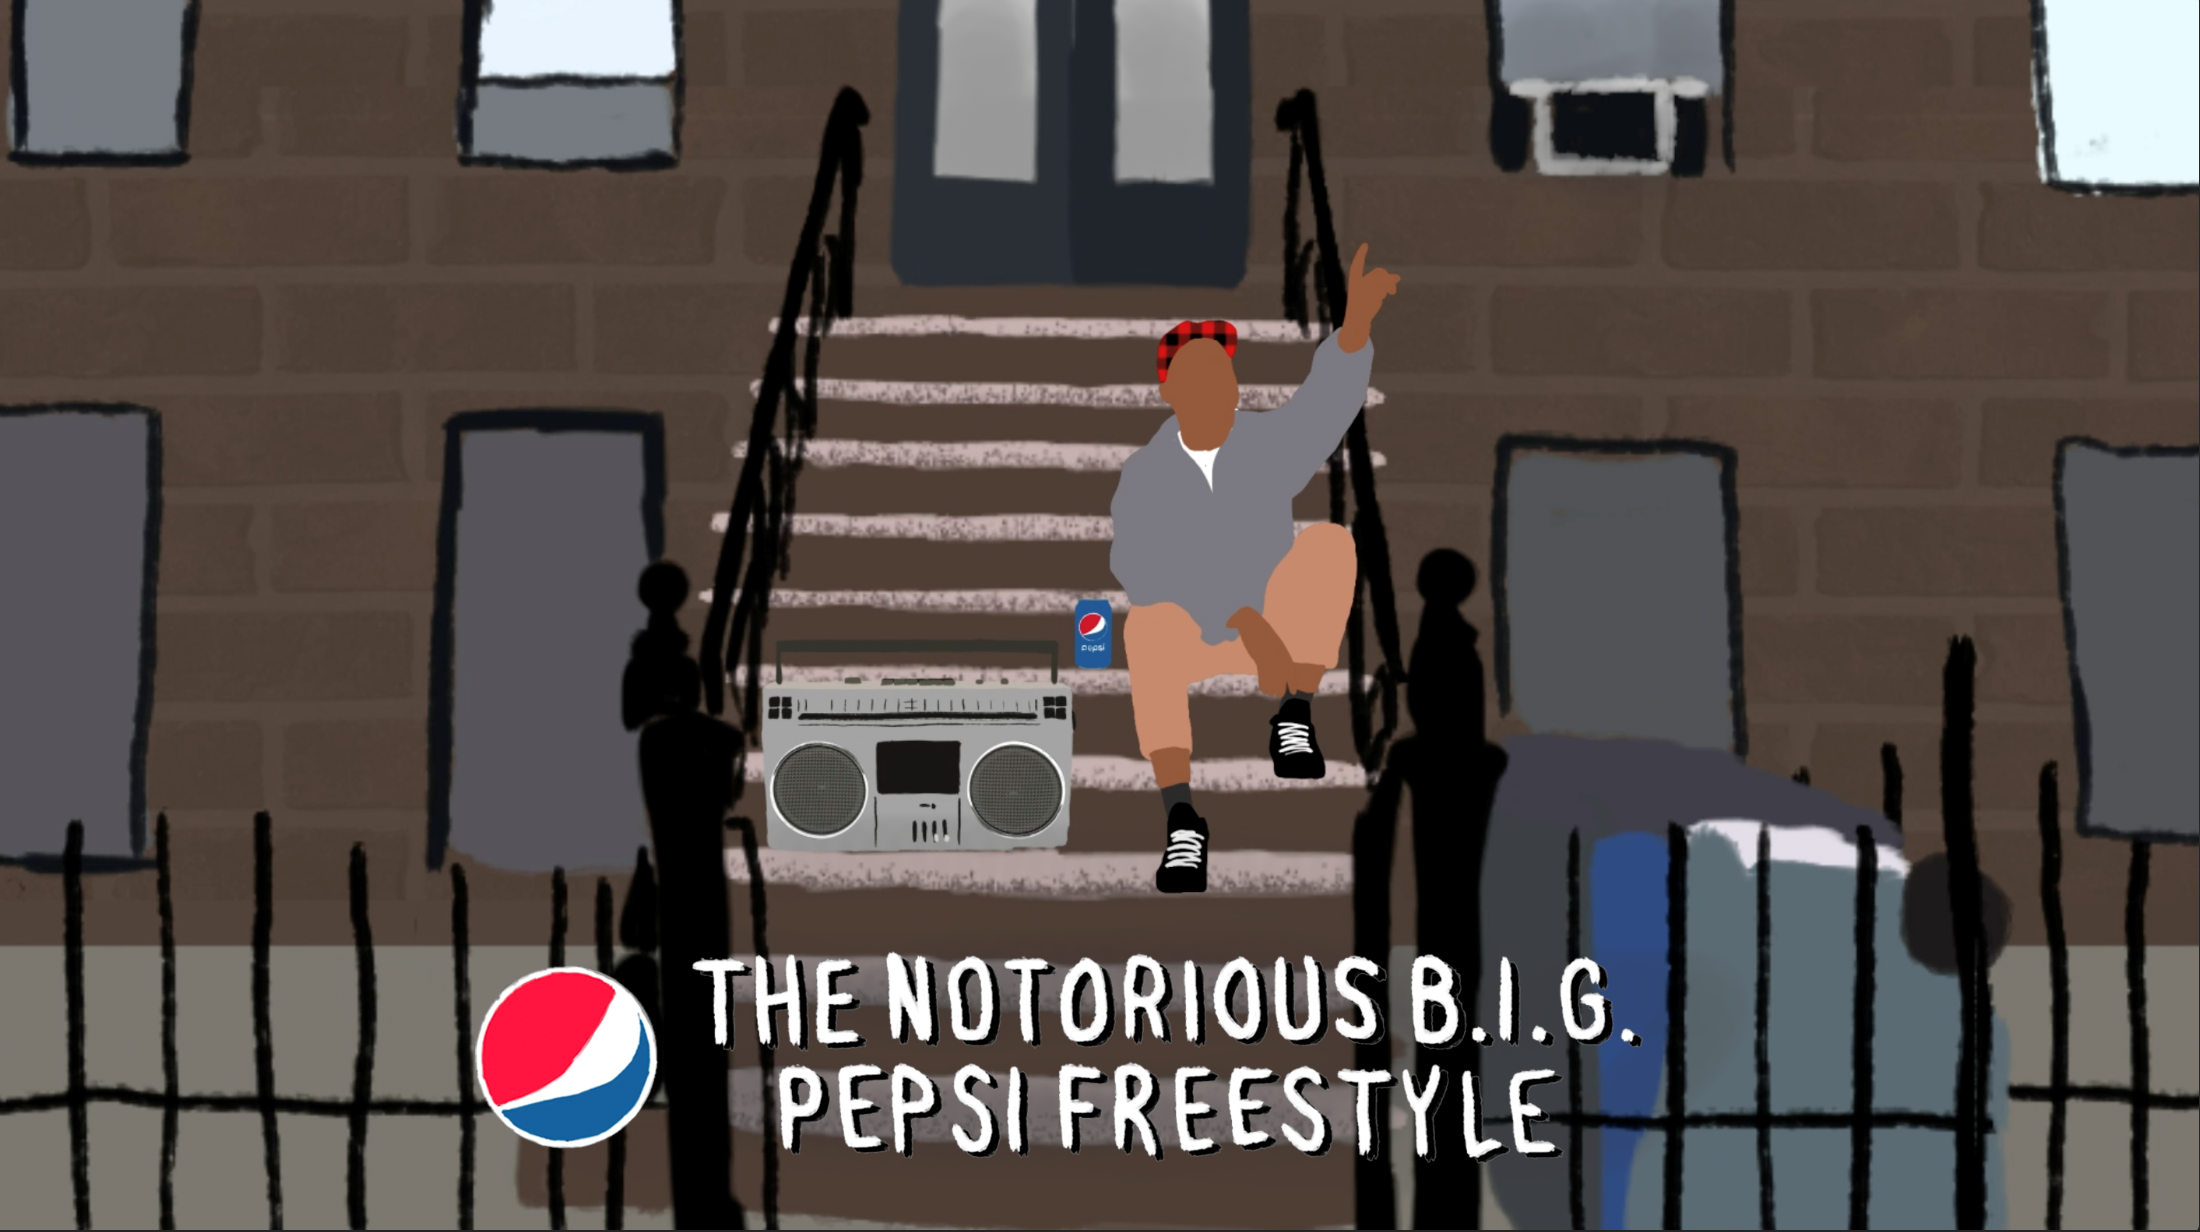 Thumbnail for The NOTORIOUS B.I.G. Pepsi Freestyle